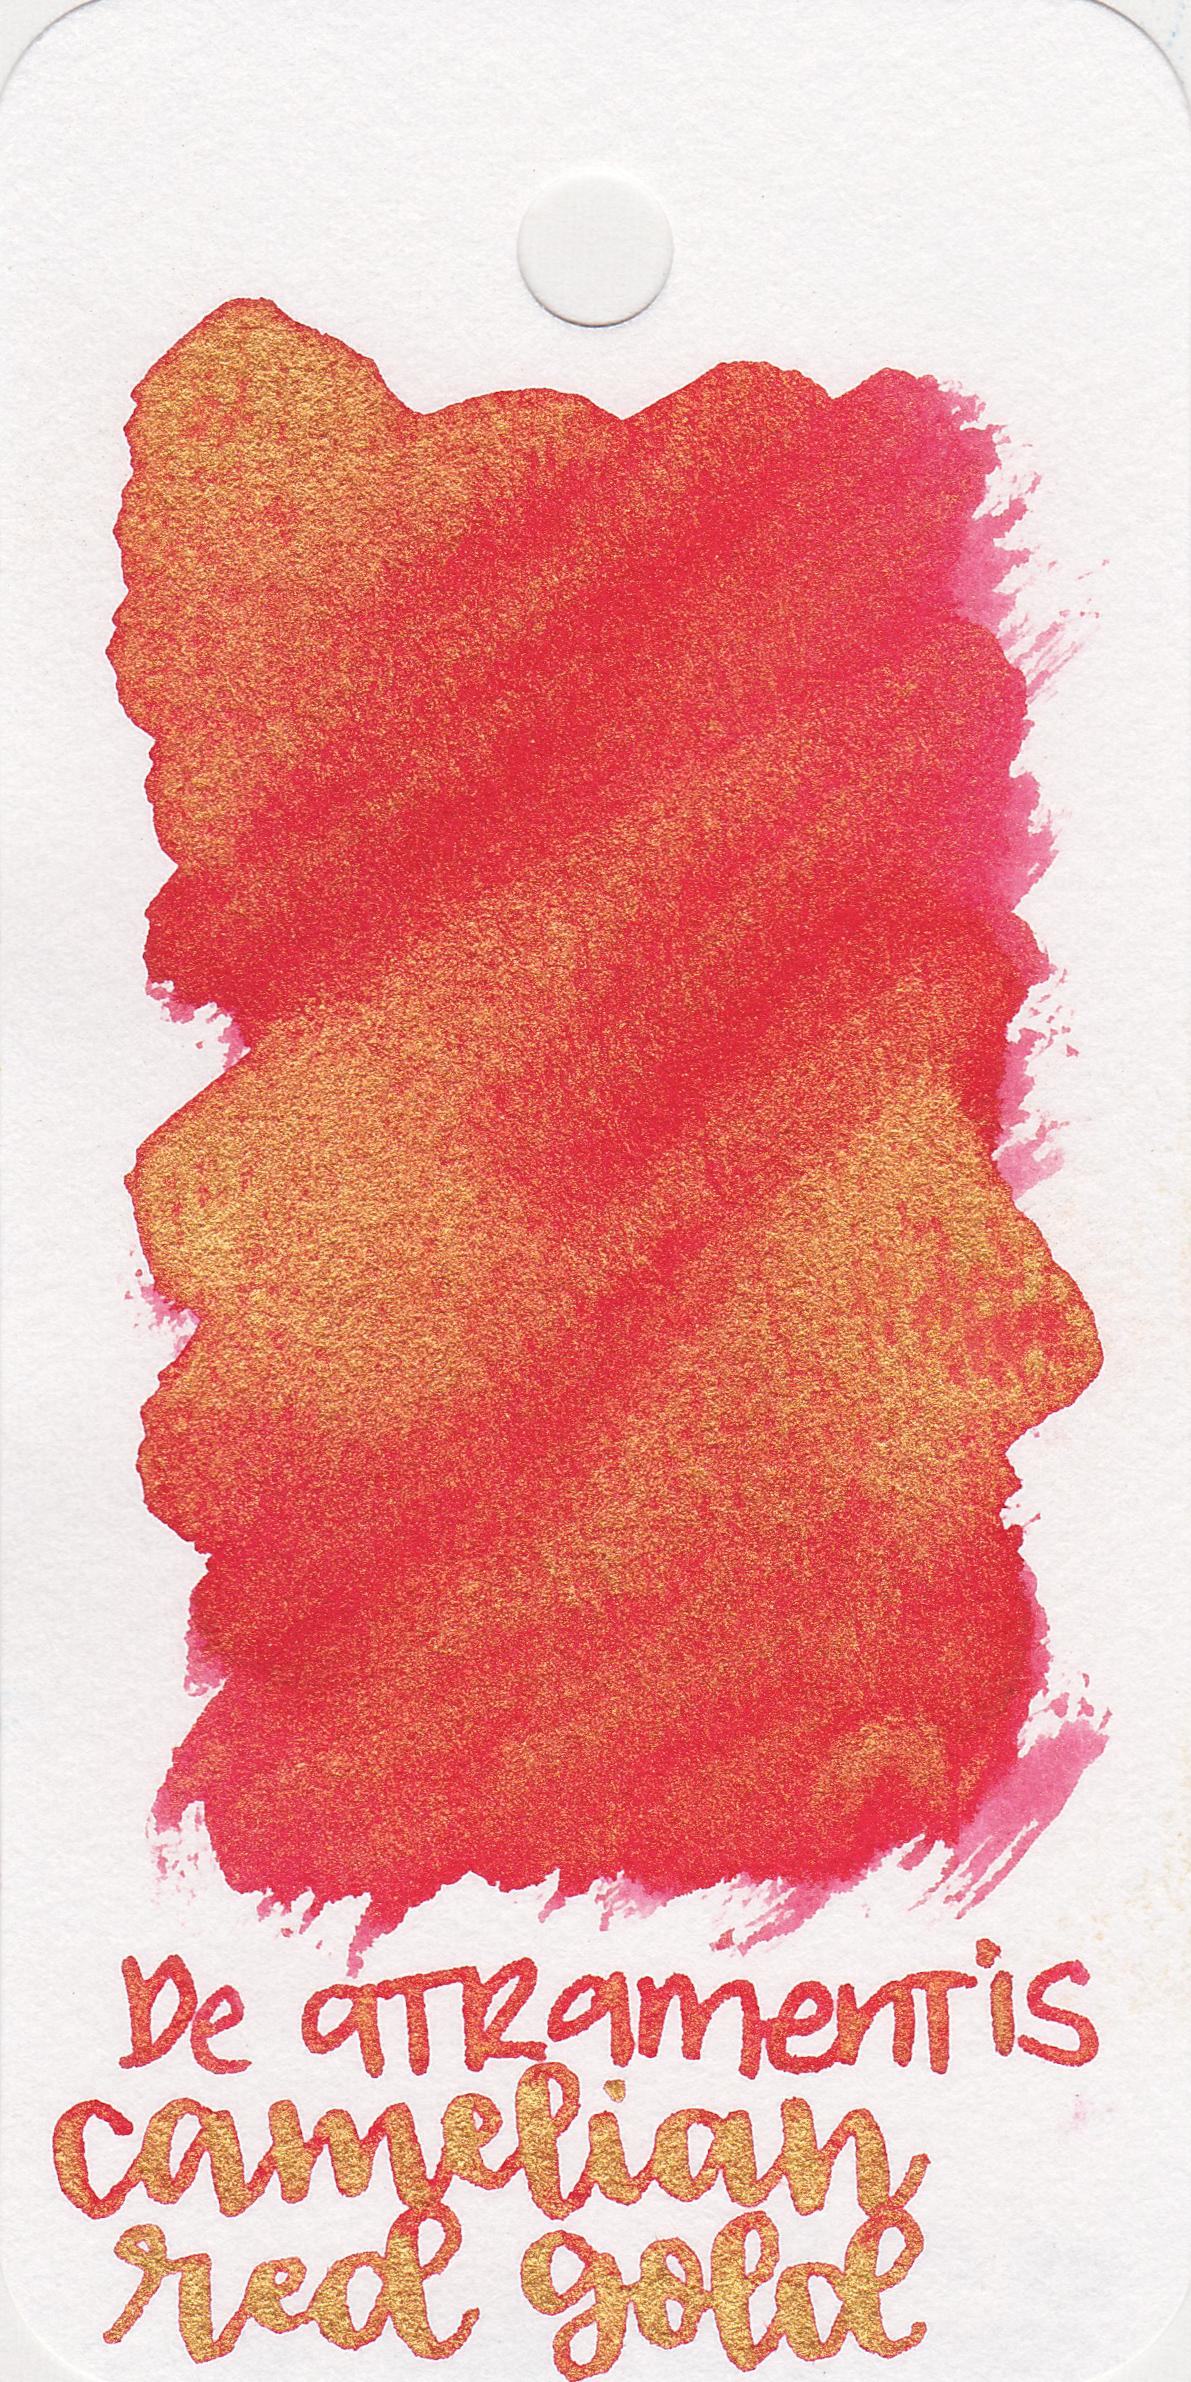 da-camelian-red-1.jpg